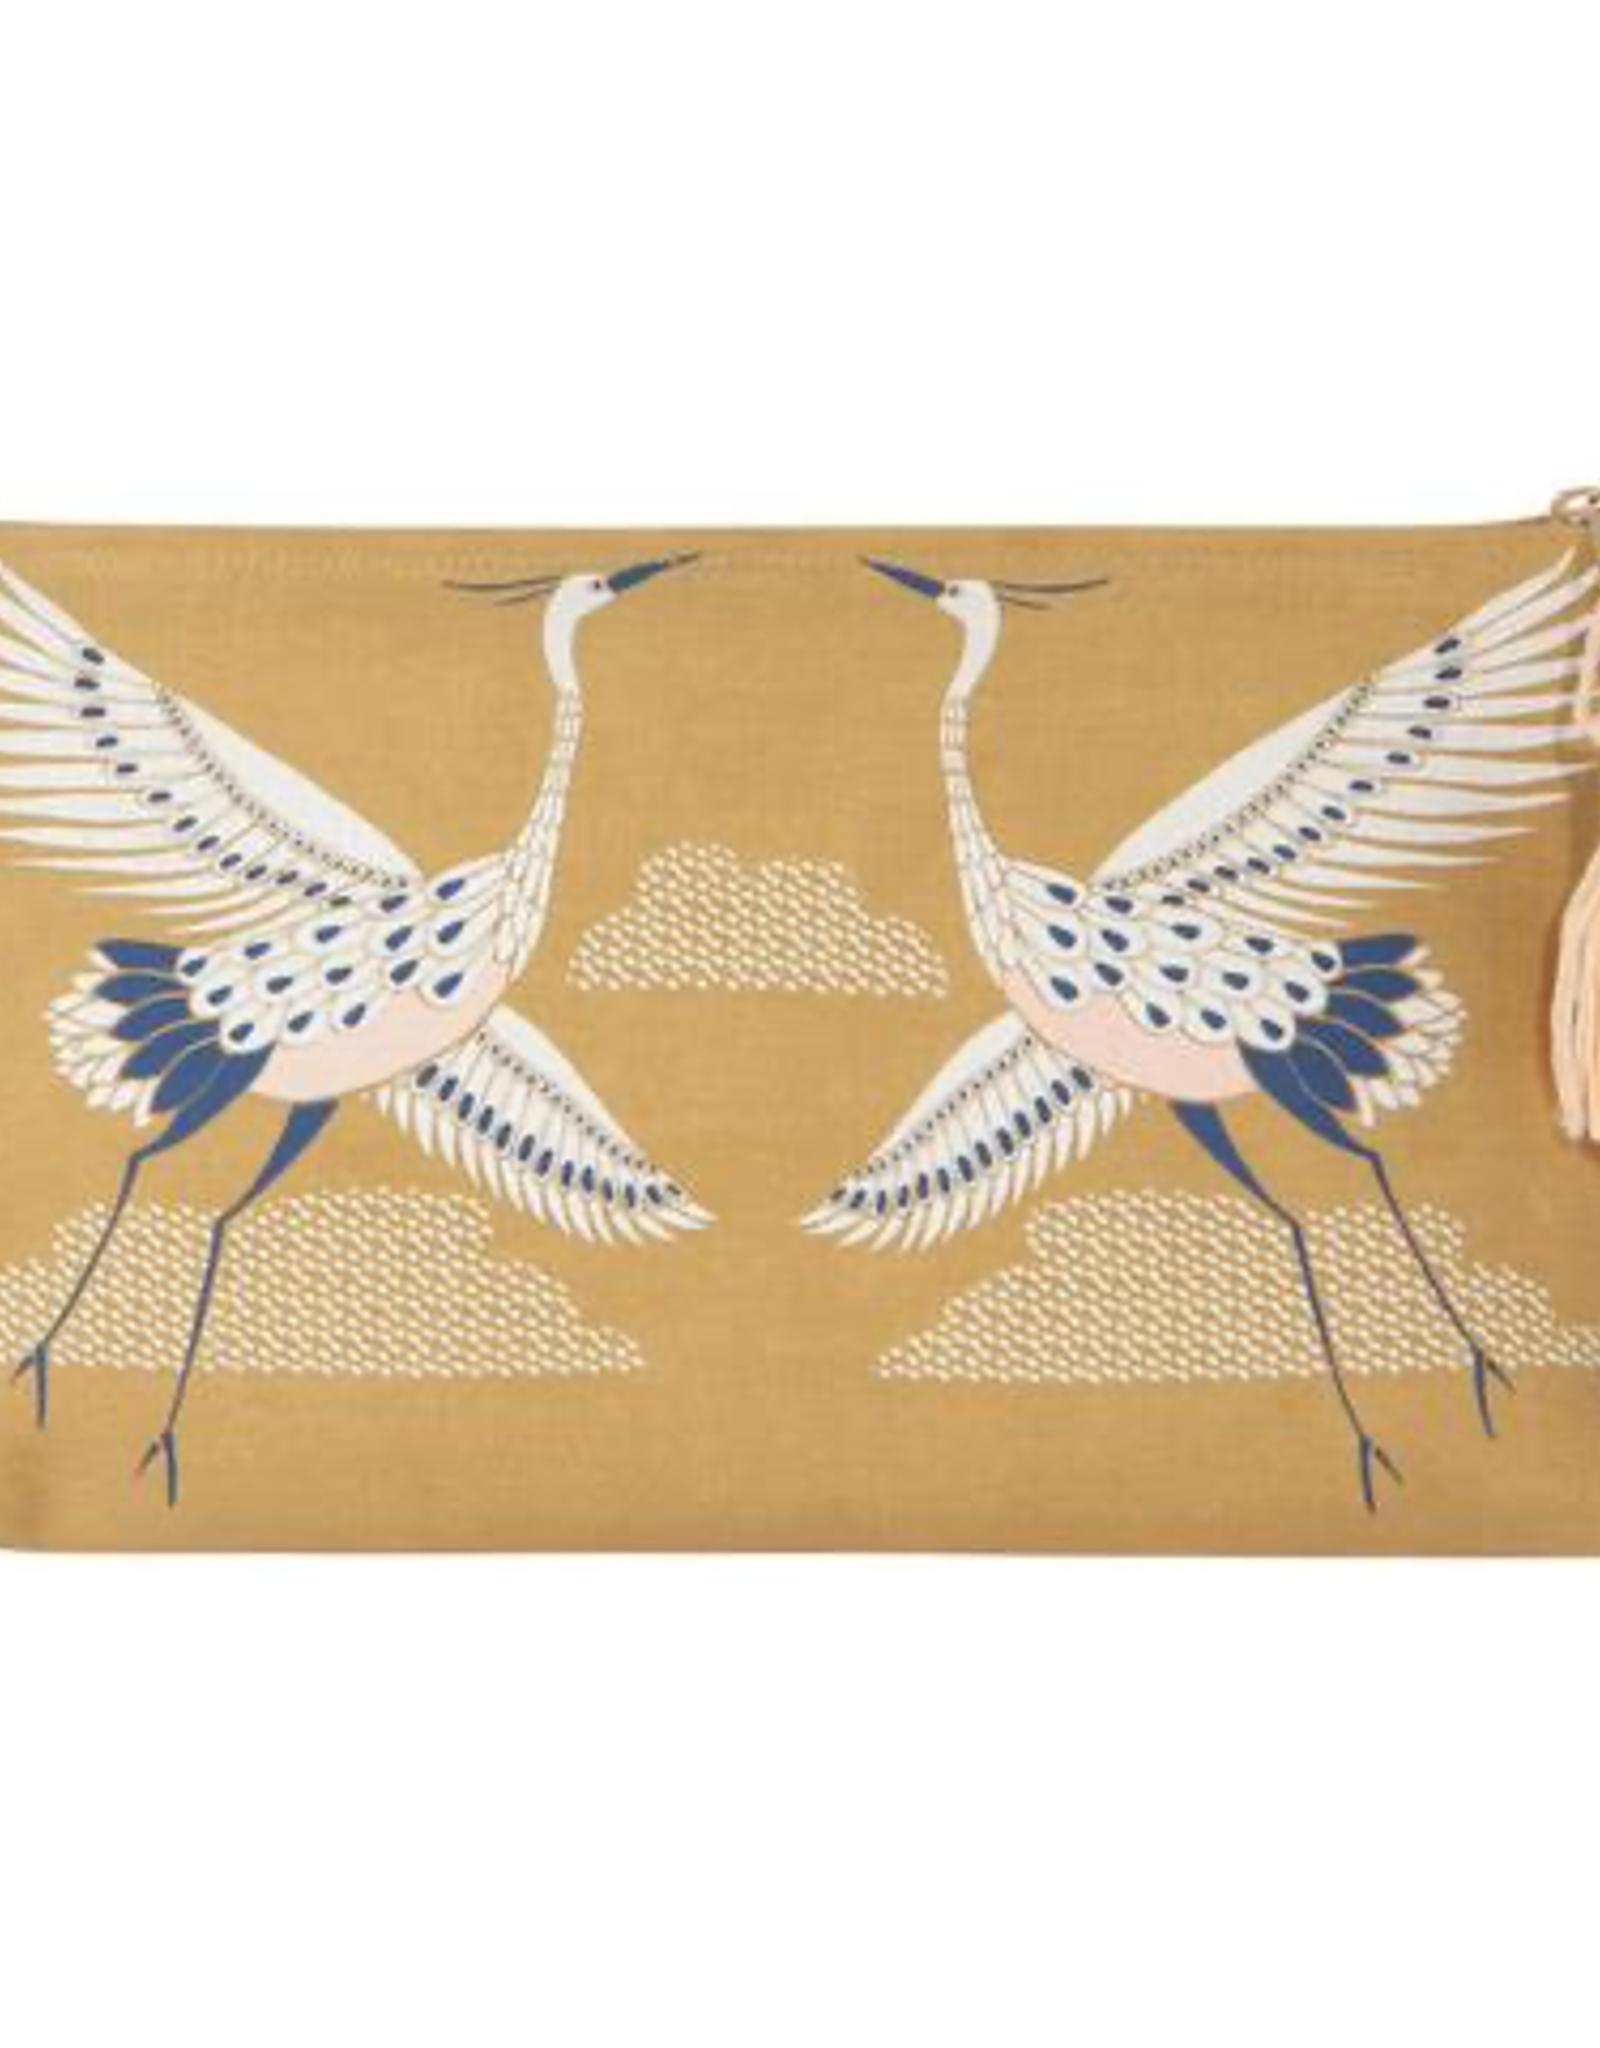 Danica Danica Flight Fancy Linen Cosmetic Bag-Large